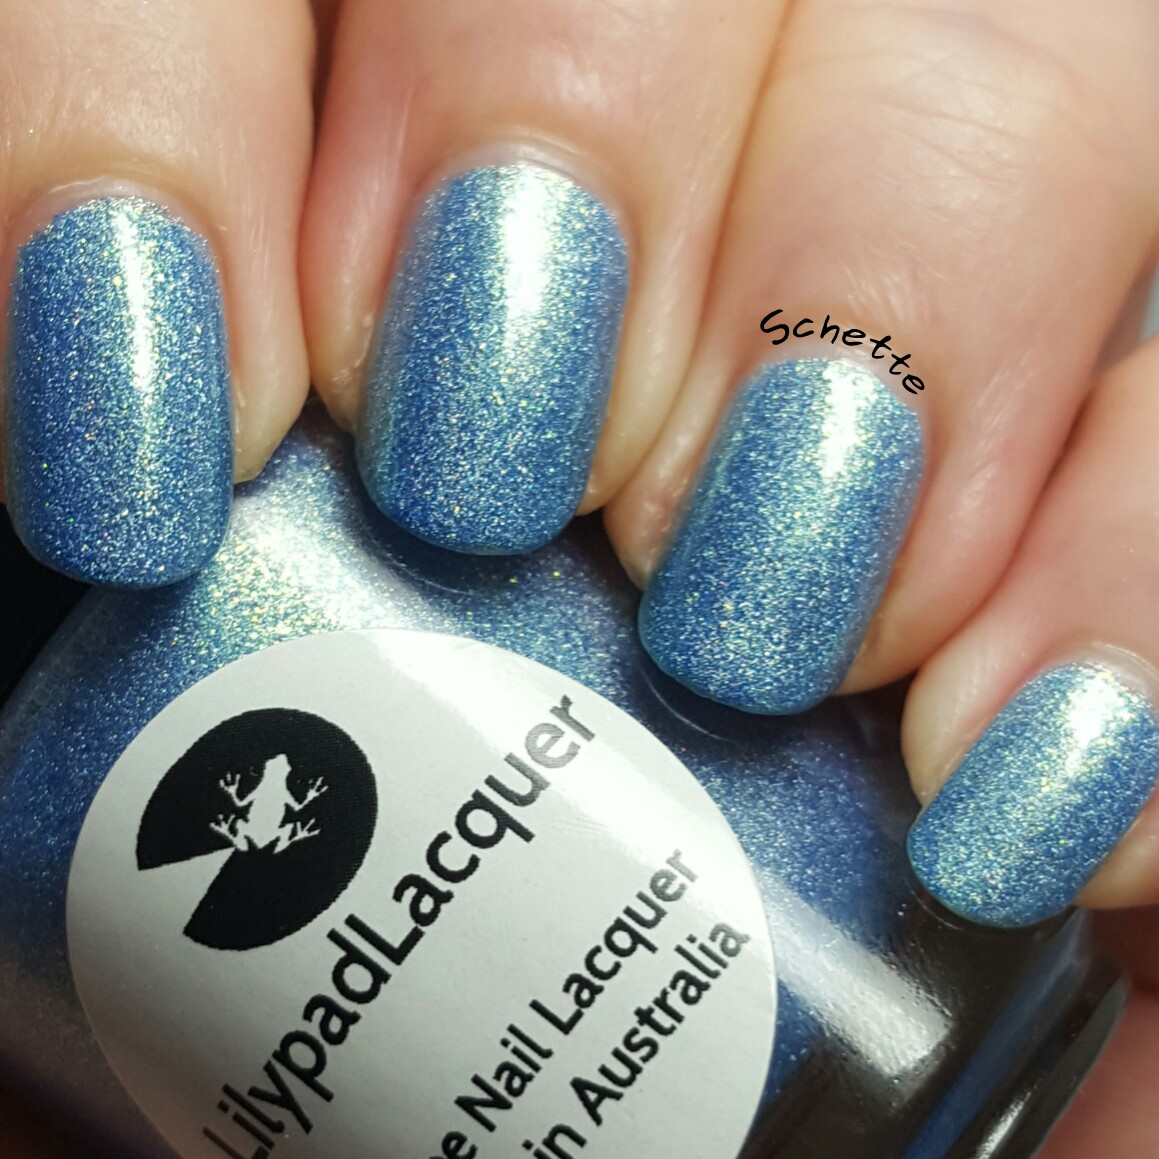 Lilypad Lacquer - I got blues babe